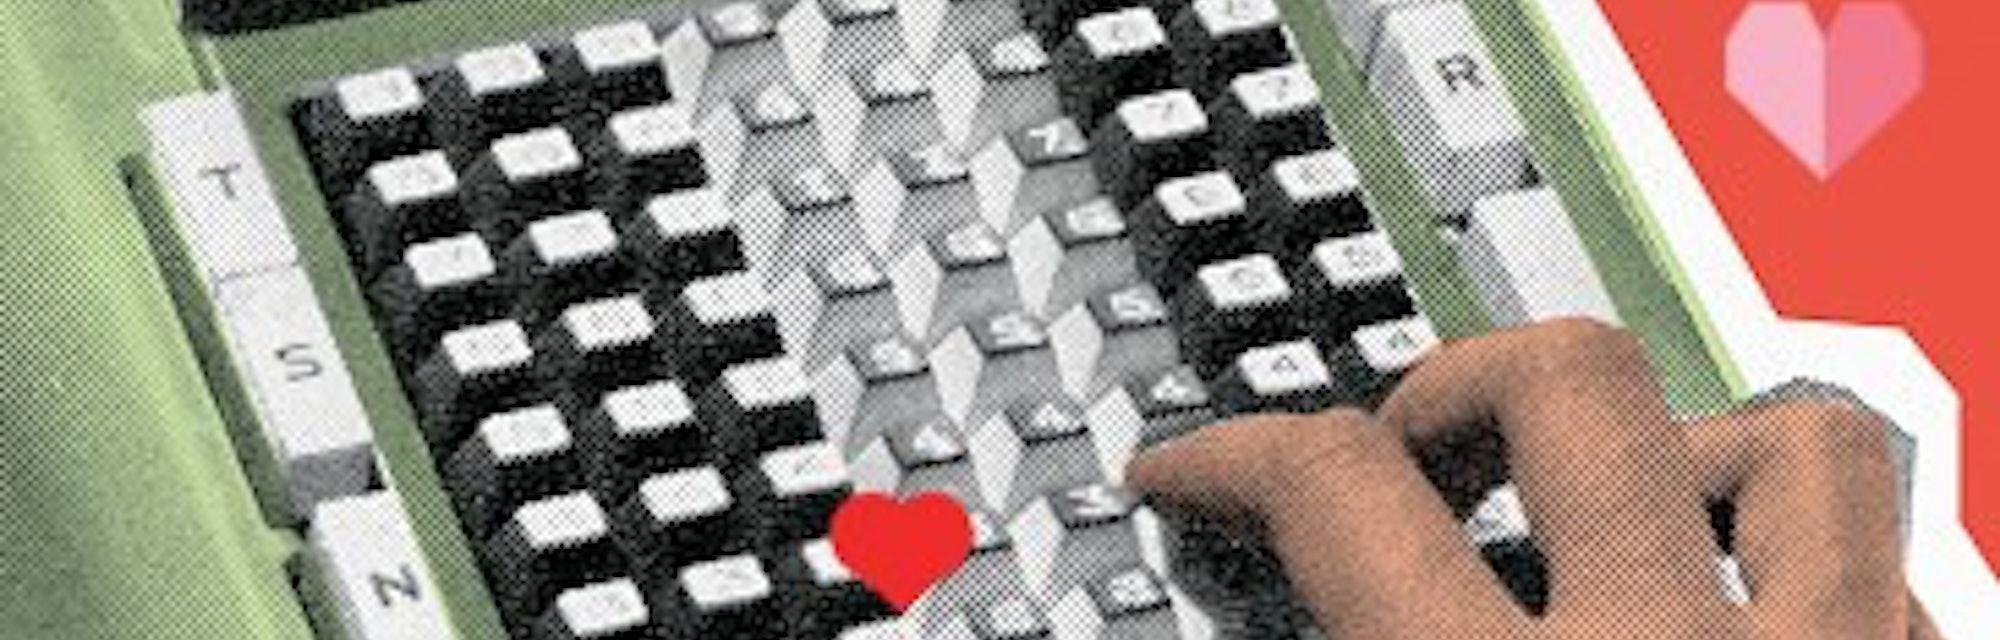 Dating calculator game